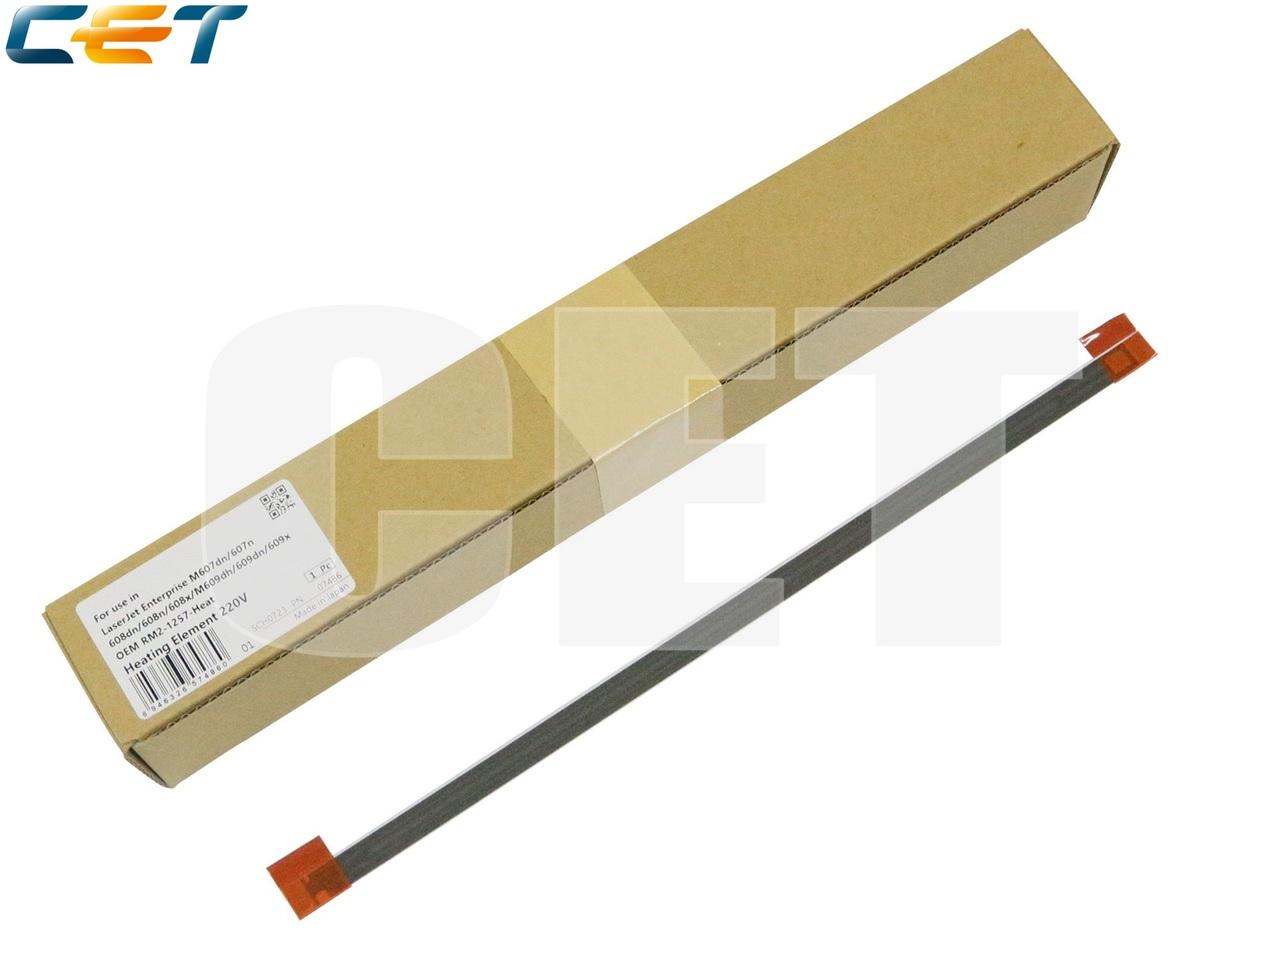 Нагревательный элемент для HP LaserJet EnterpriseM607n/608n/609h (CET), CET7486